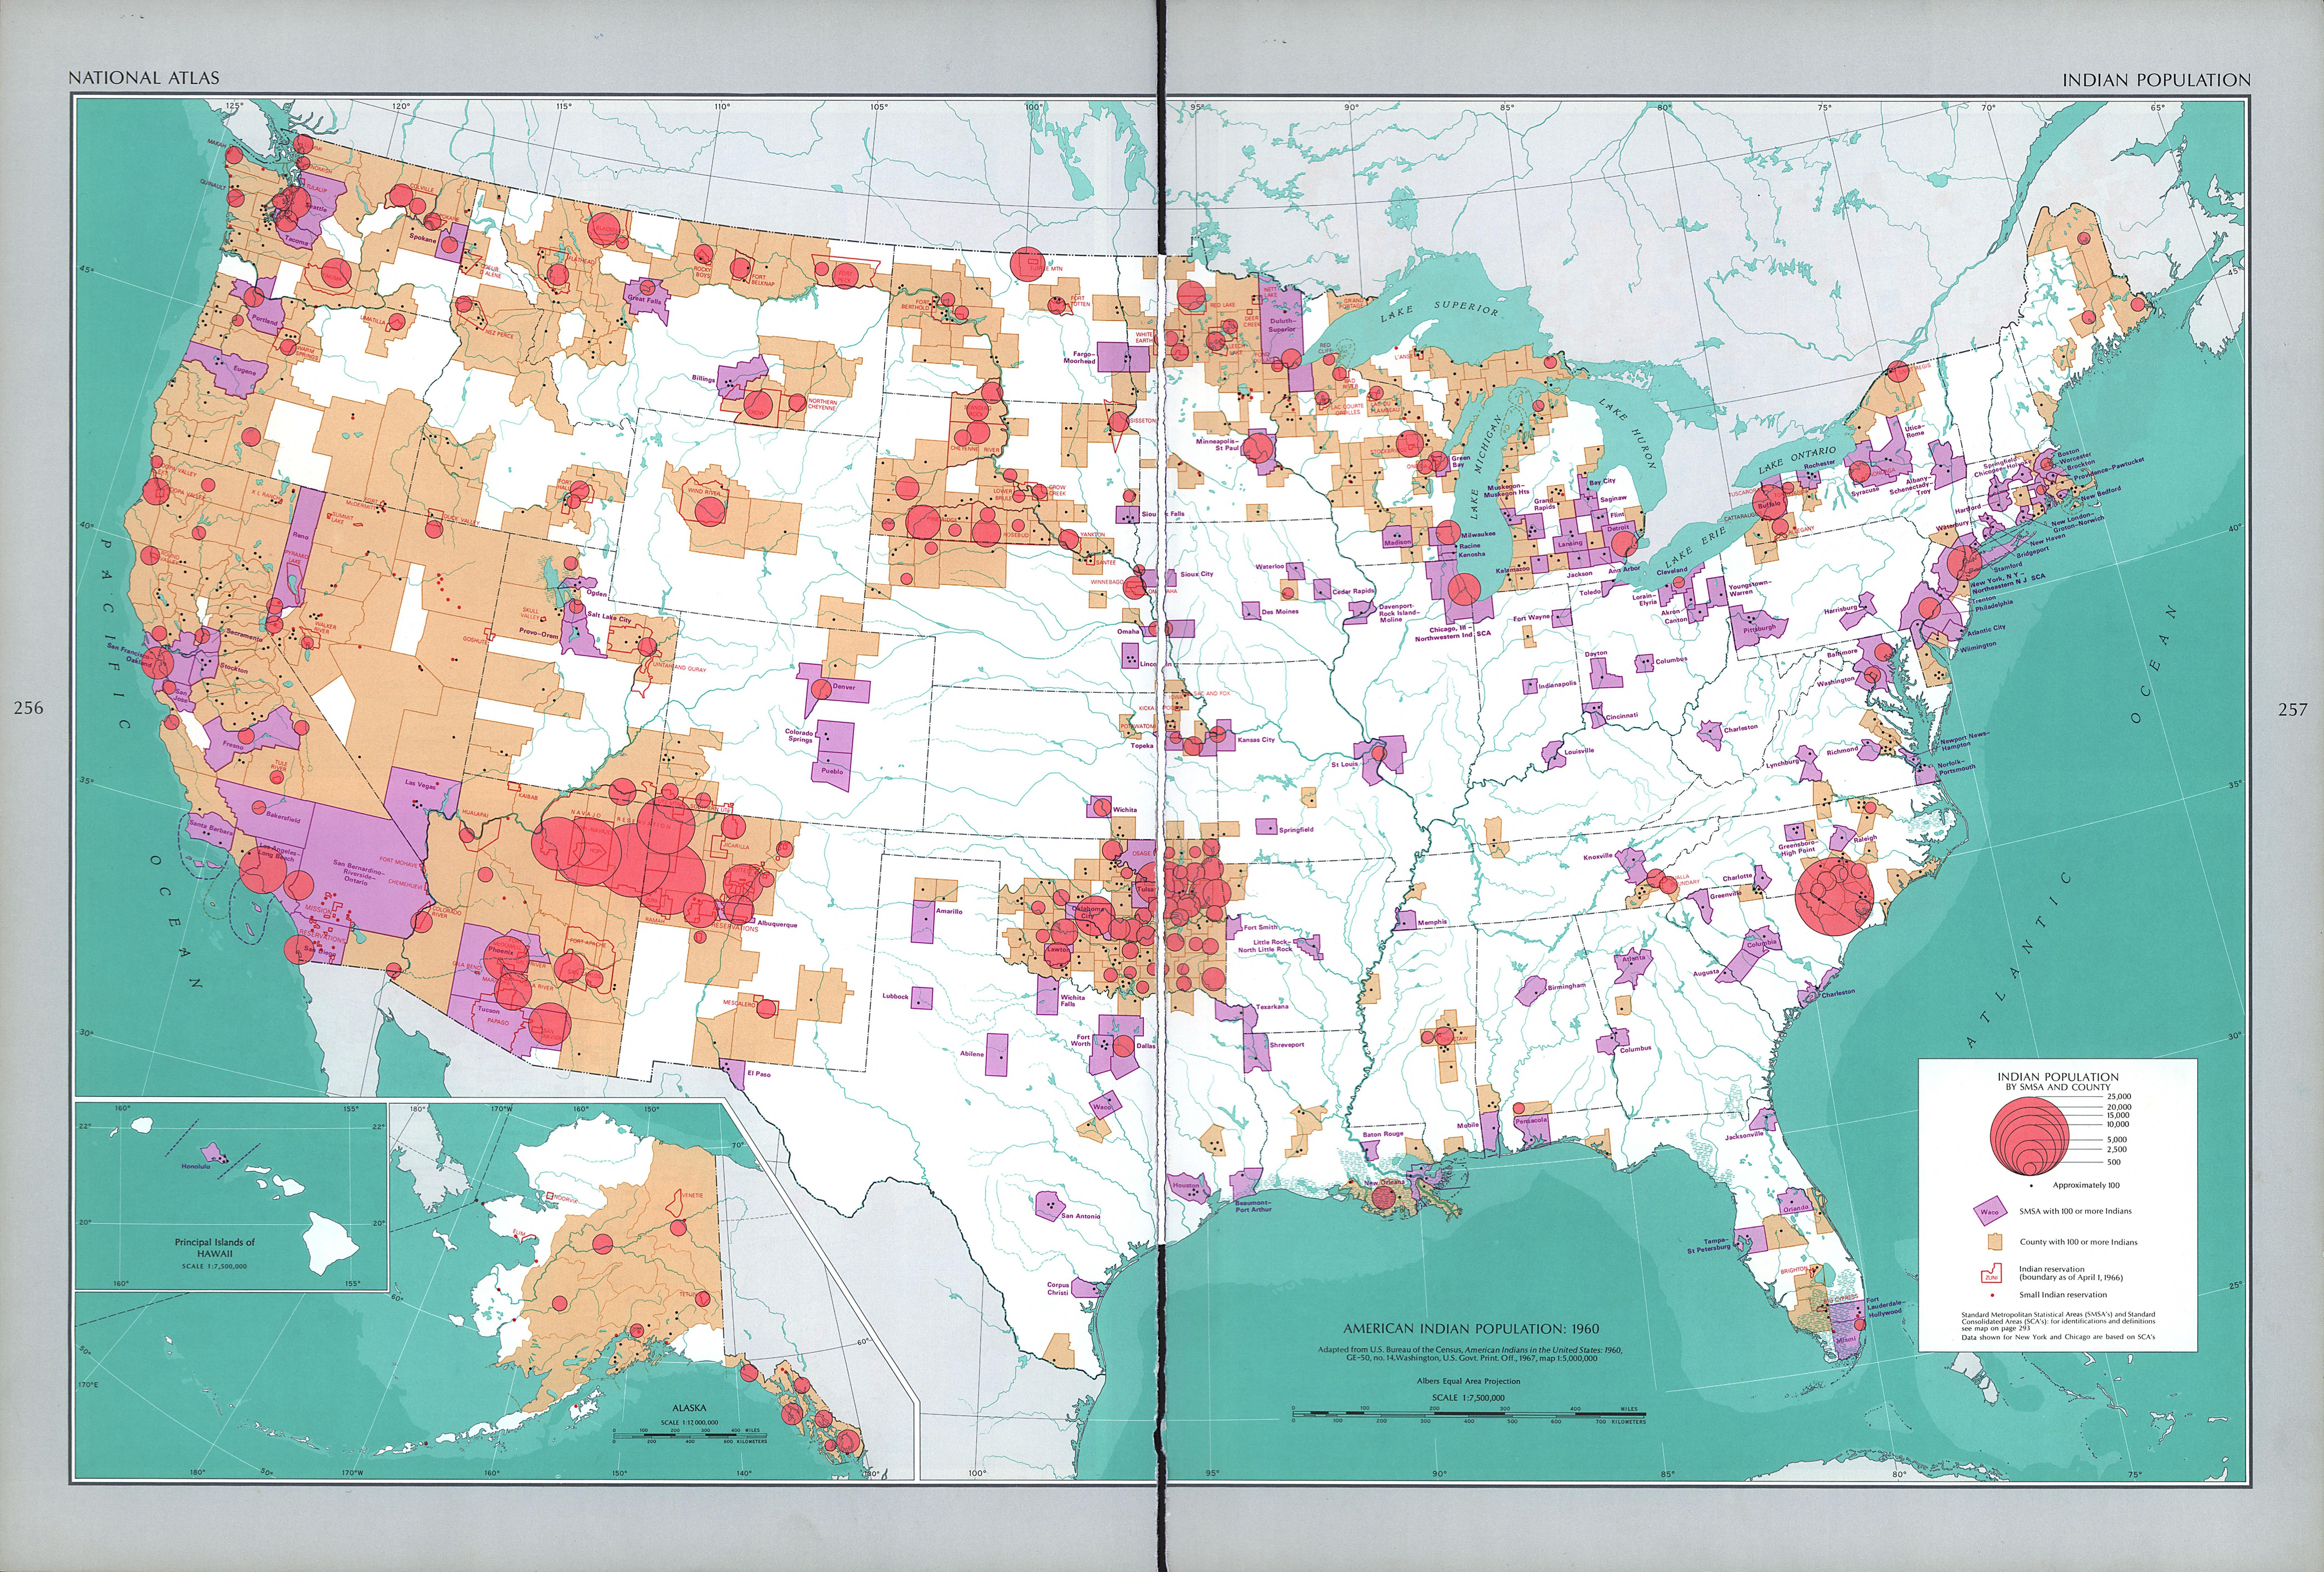 United States Indian Population 1970